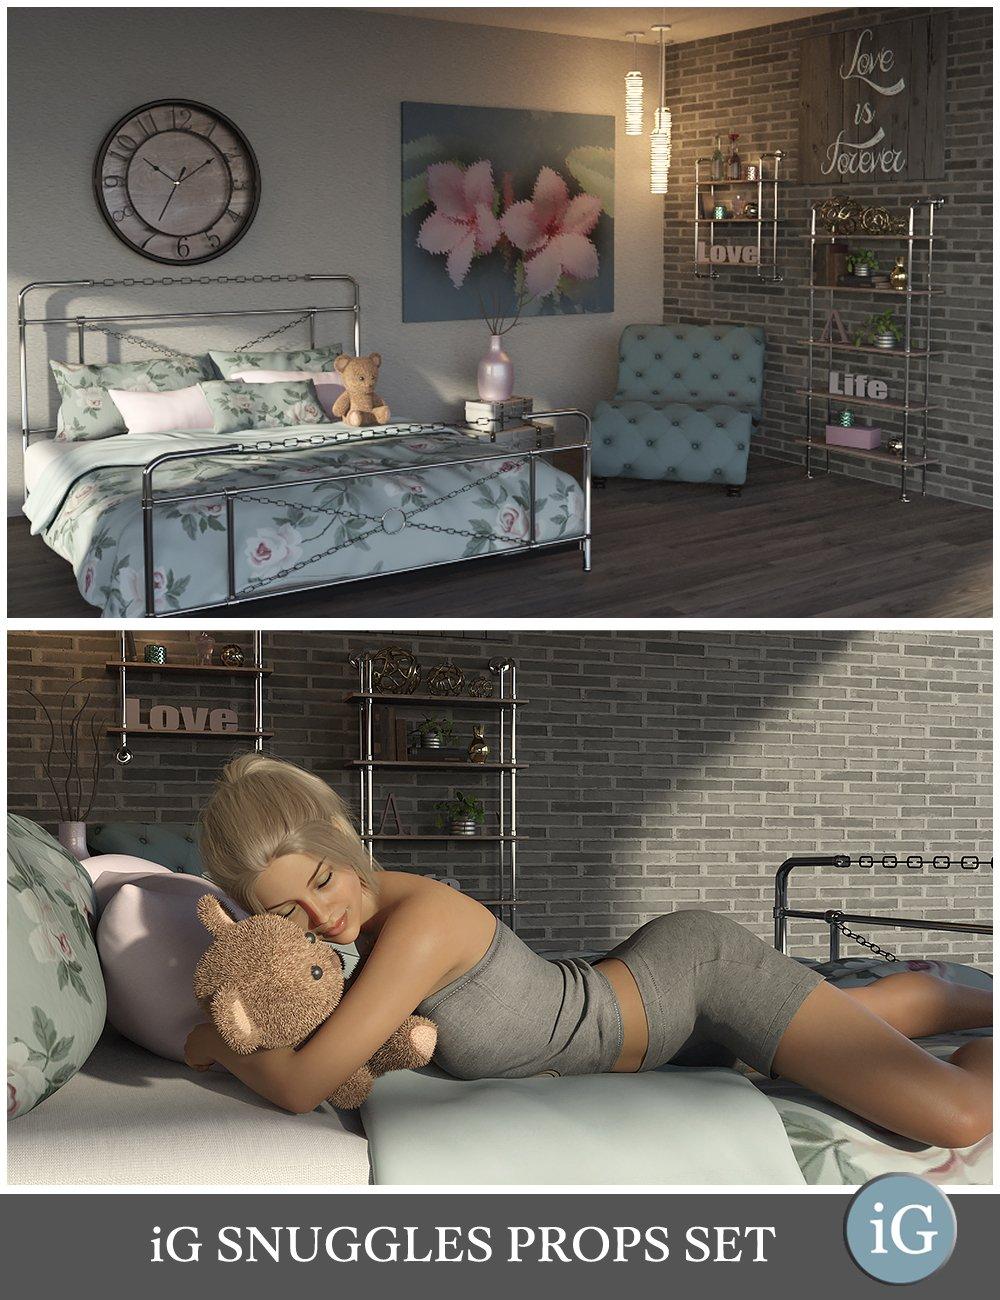 iG Snuggles Prop Set by: i3D_LotusValery3D, 3D Models by Daz 3D